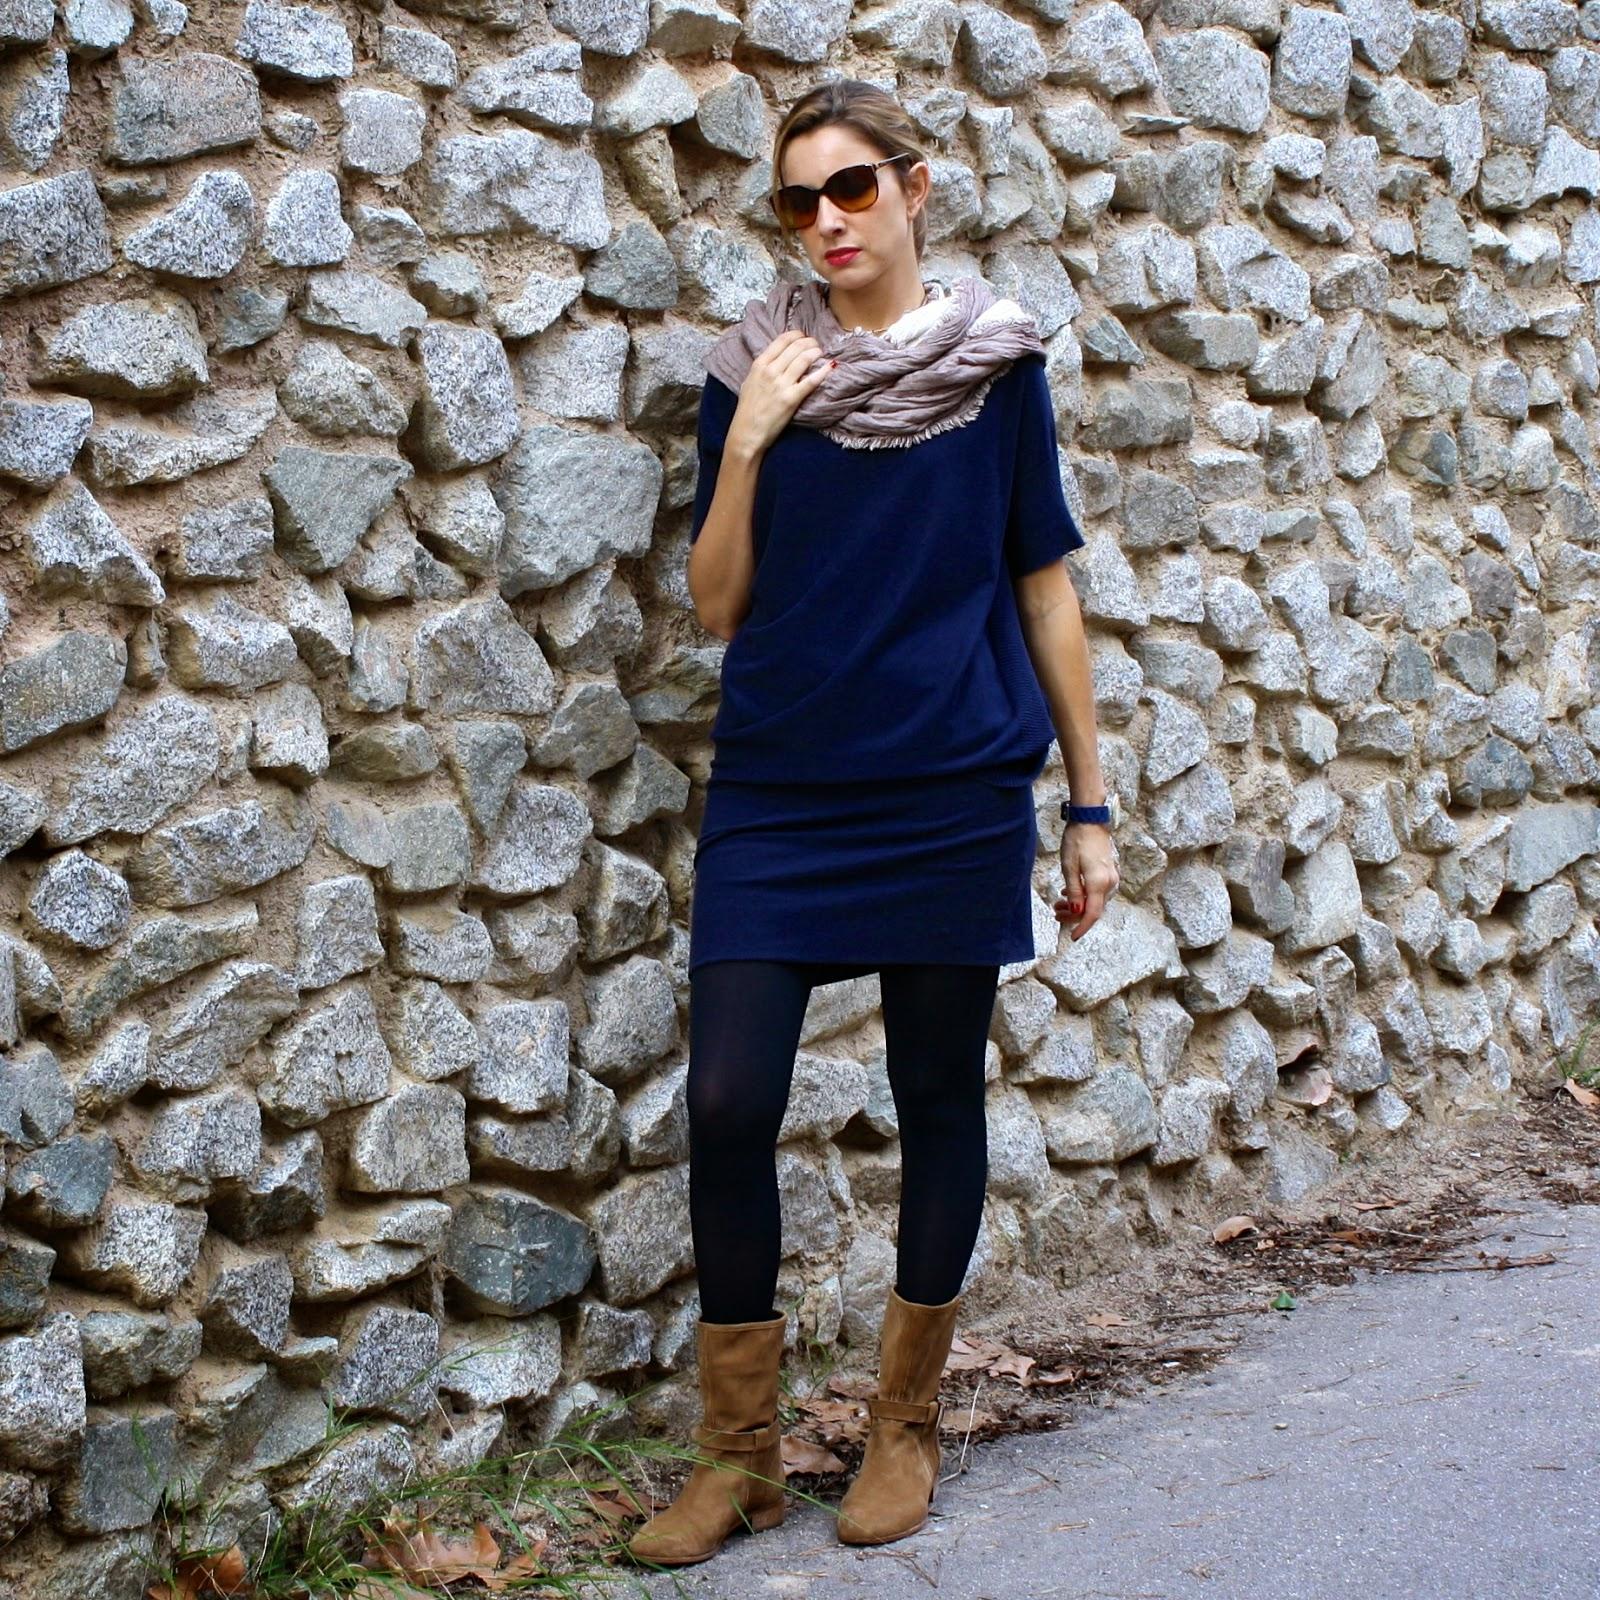 Color medias para vestido azul marino